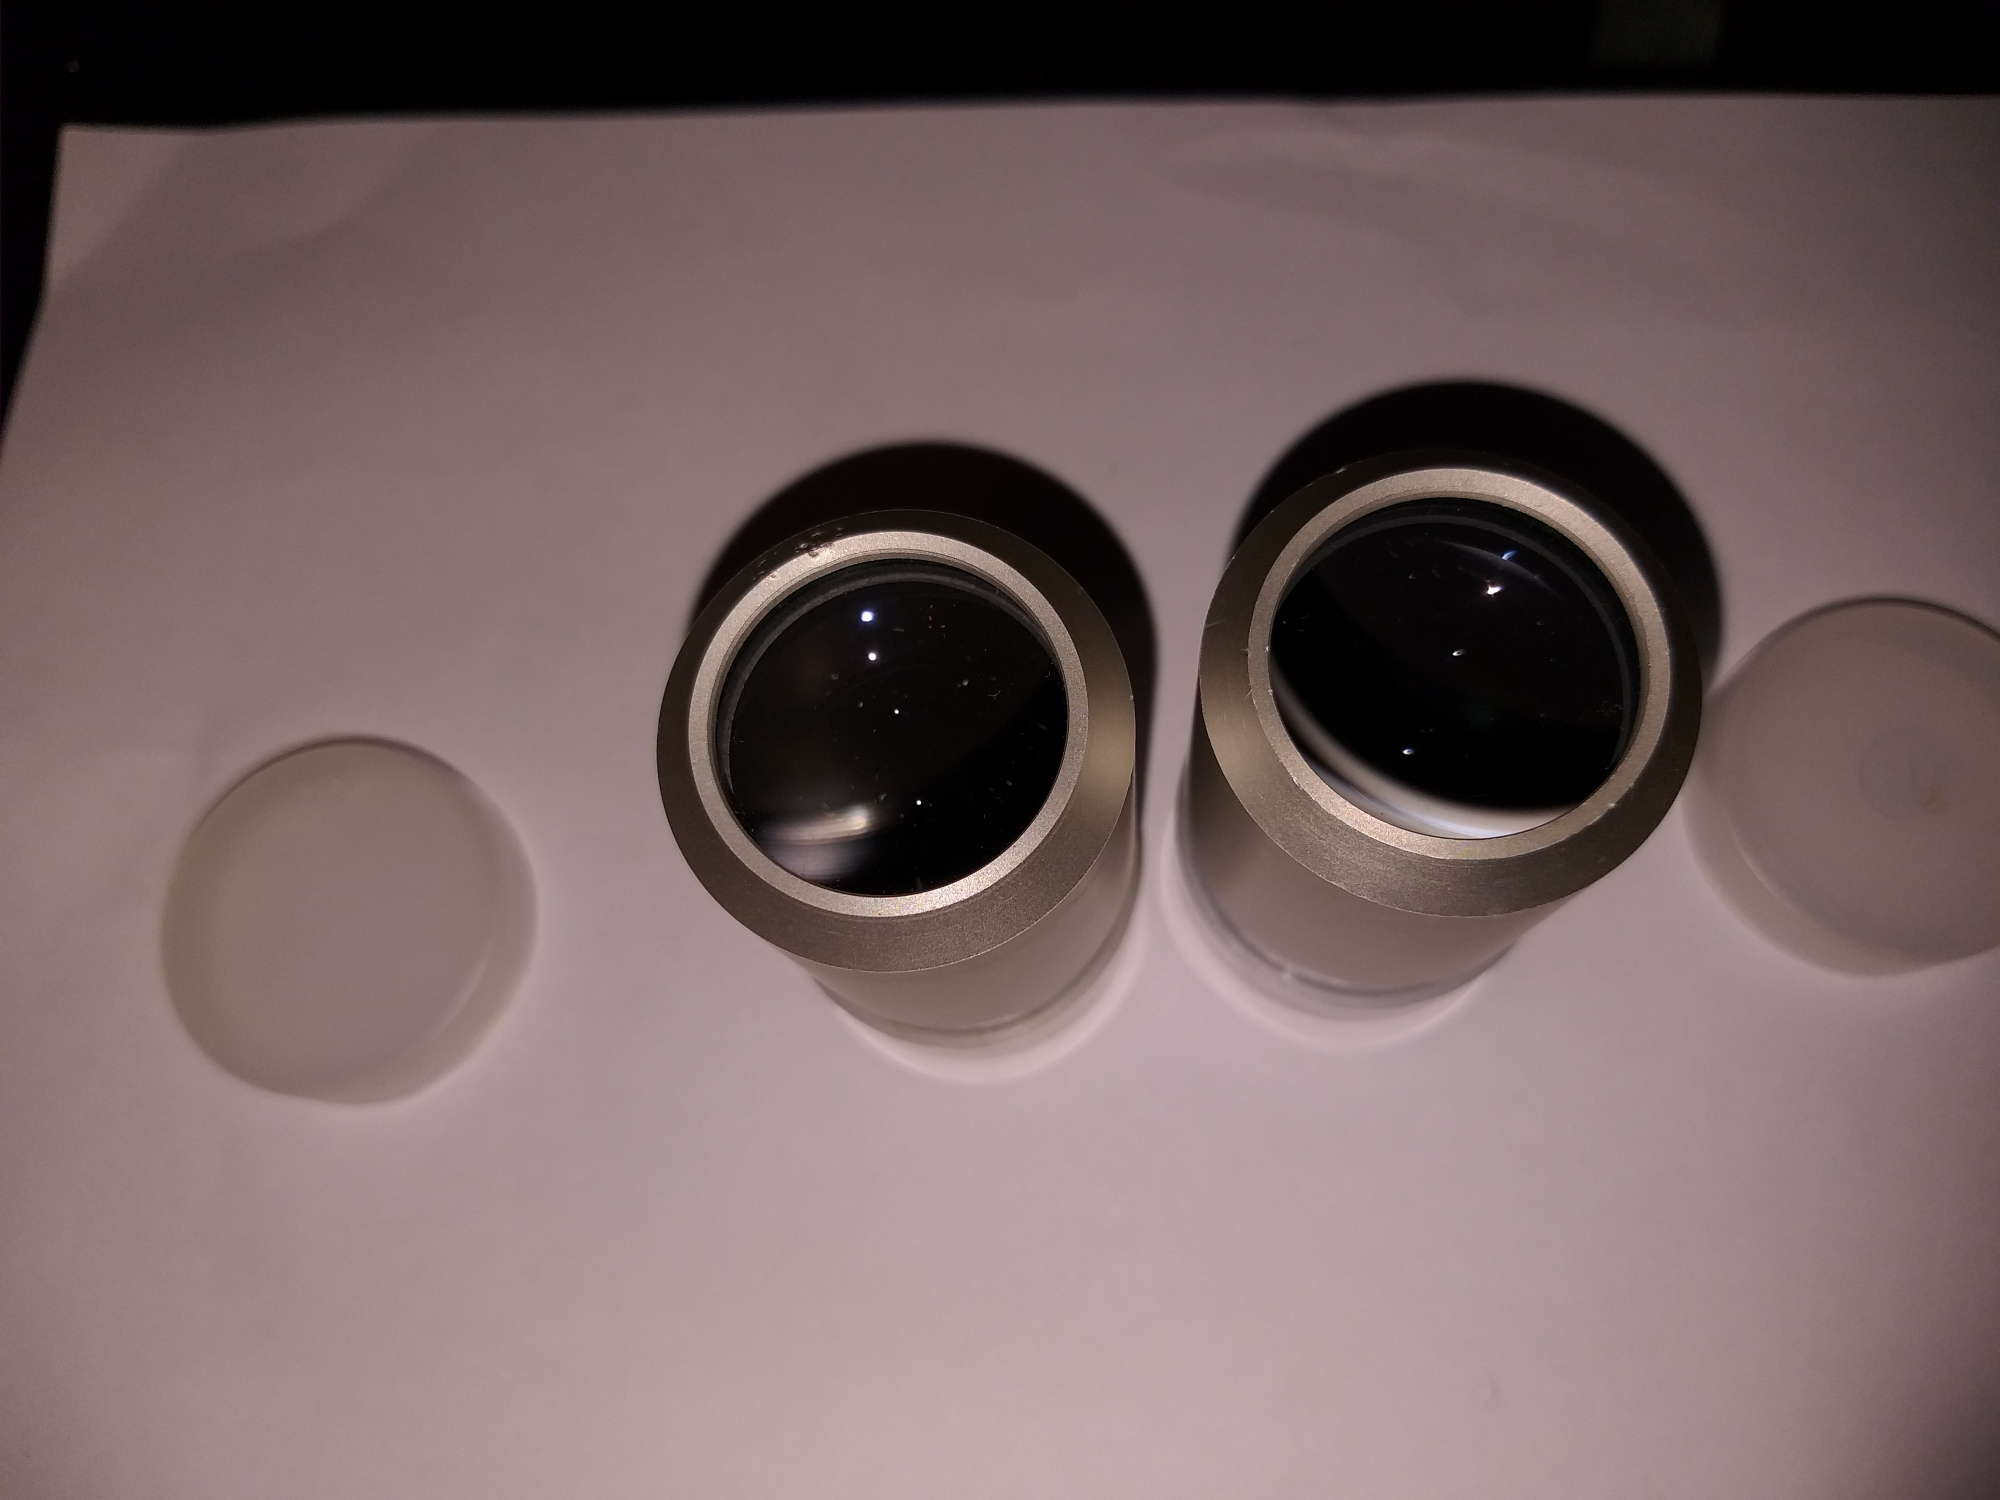 Celestron lentille - .jpg